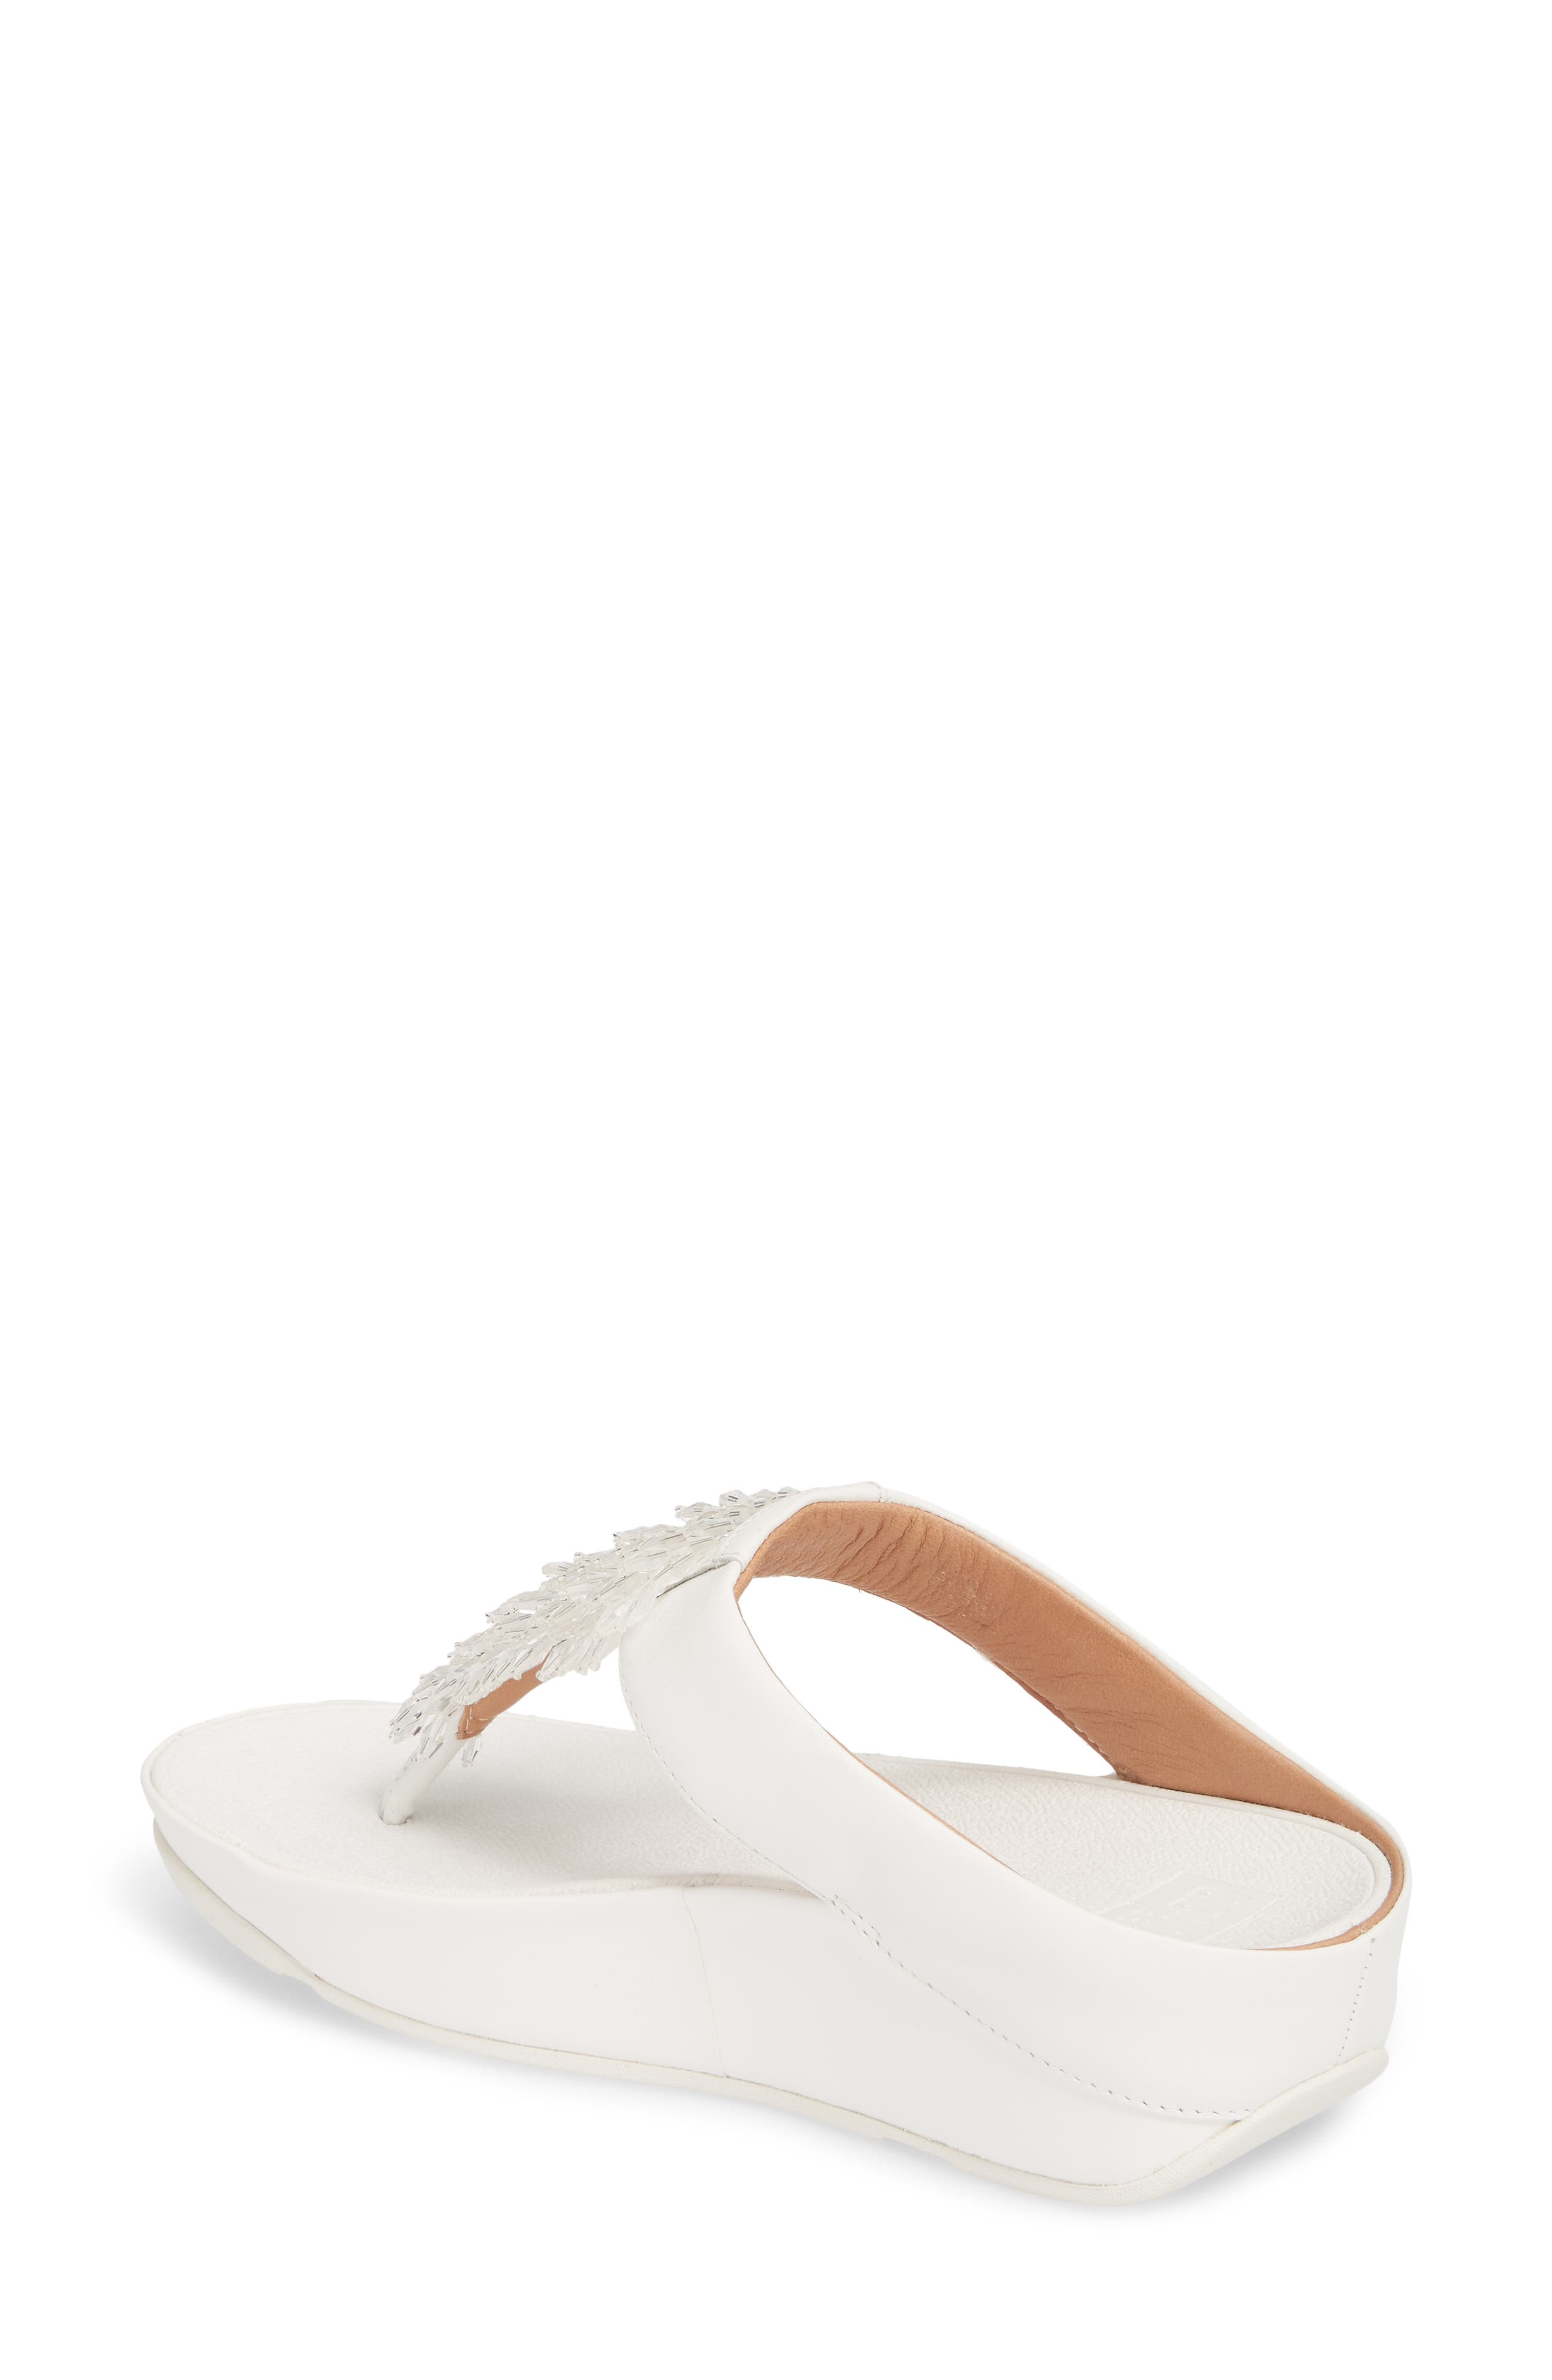 Rumba Sandal,                             Alternate thumbnail 2, color,                             Urban White Leather